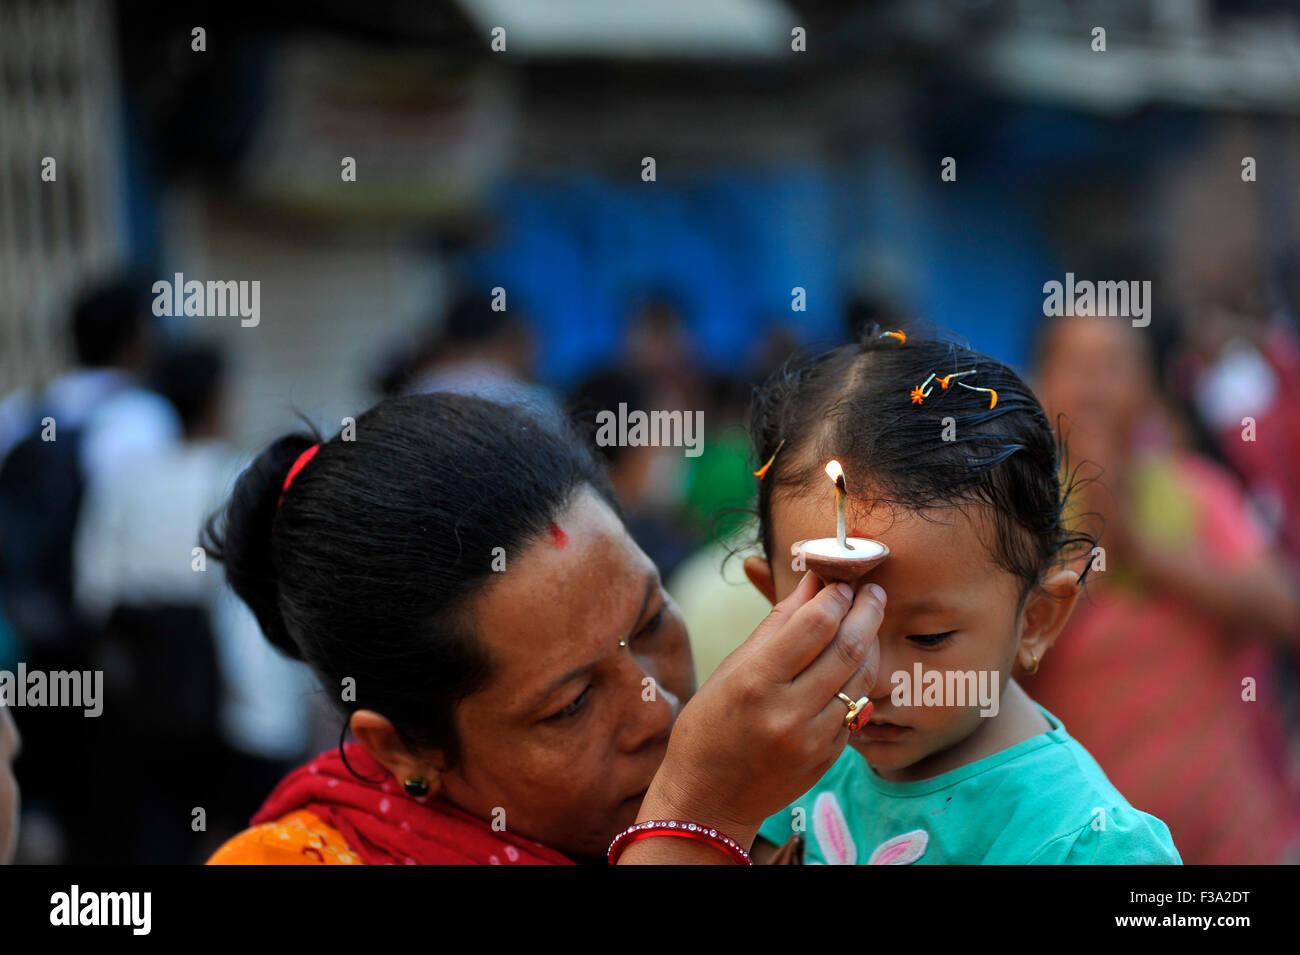 Nakhu Imágenes De Stock & Nakhu Fotos De Stock - Alamy